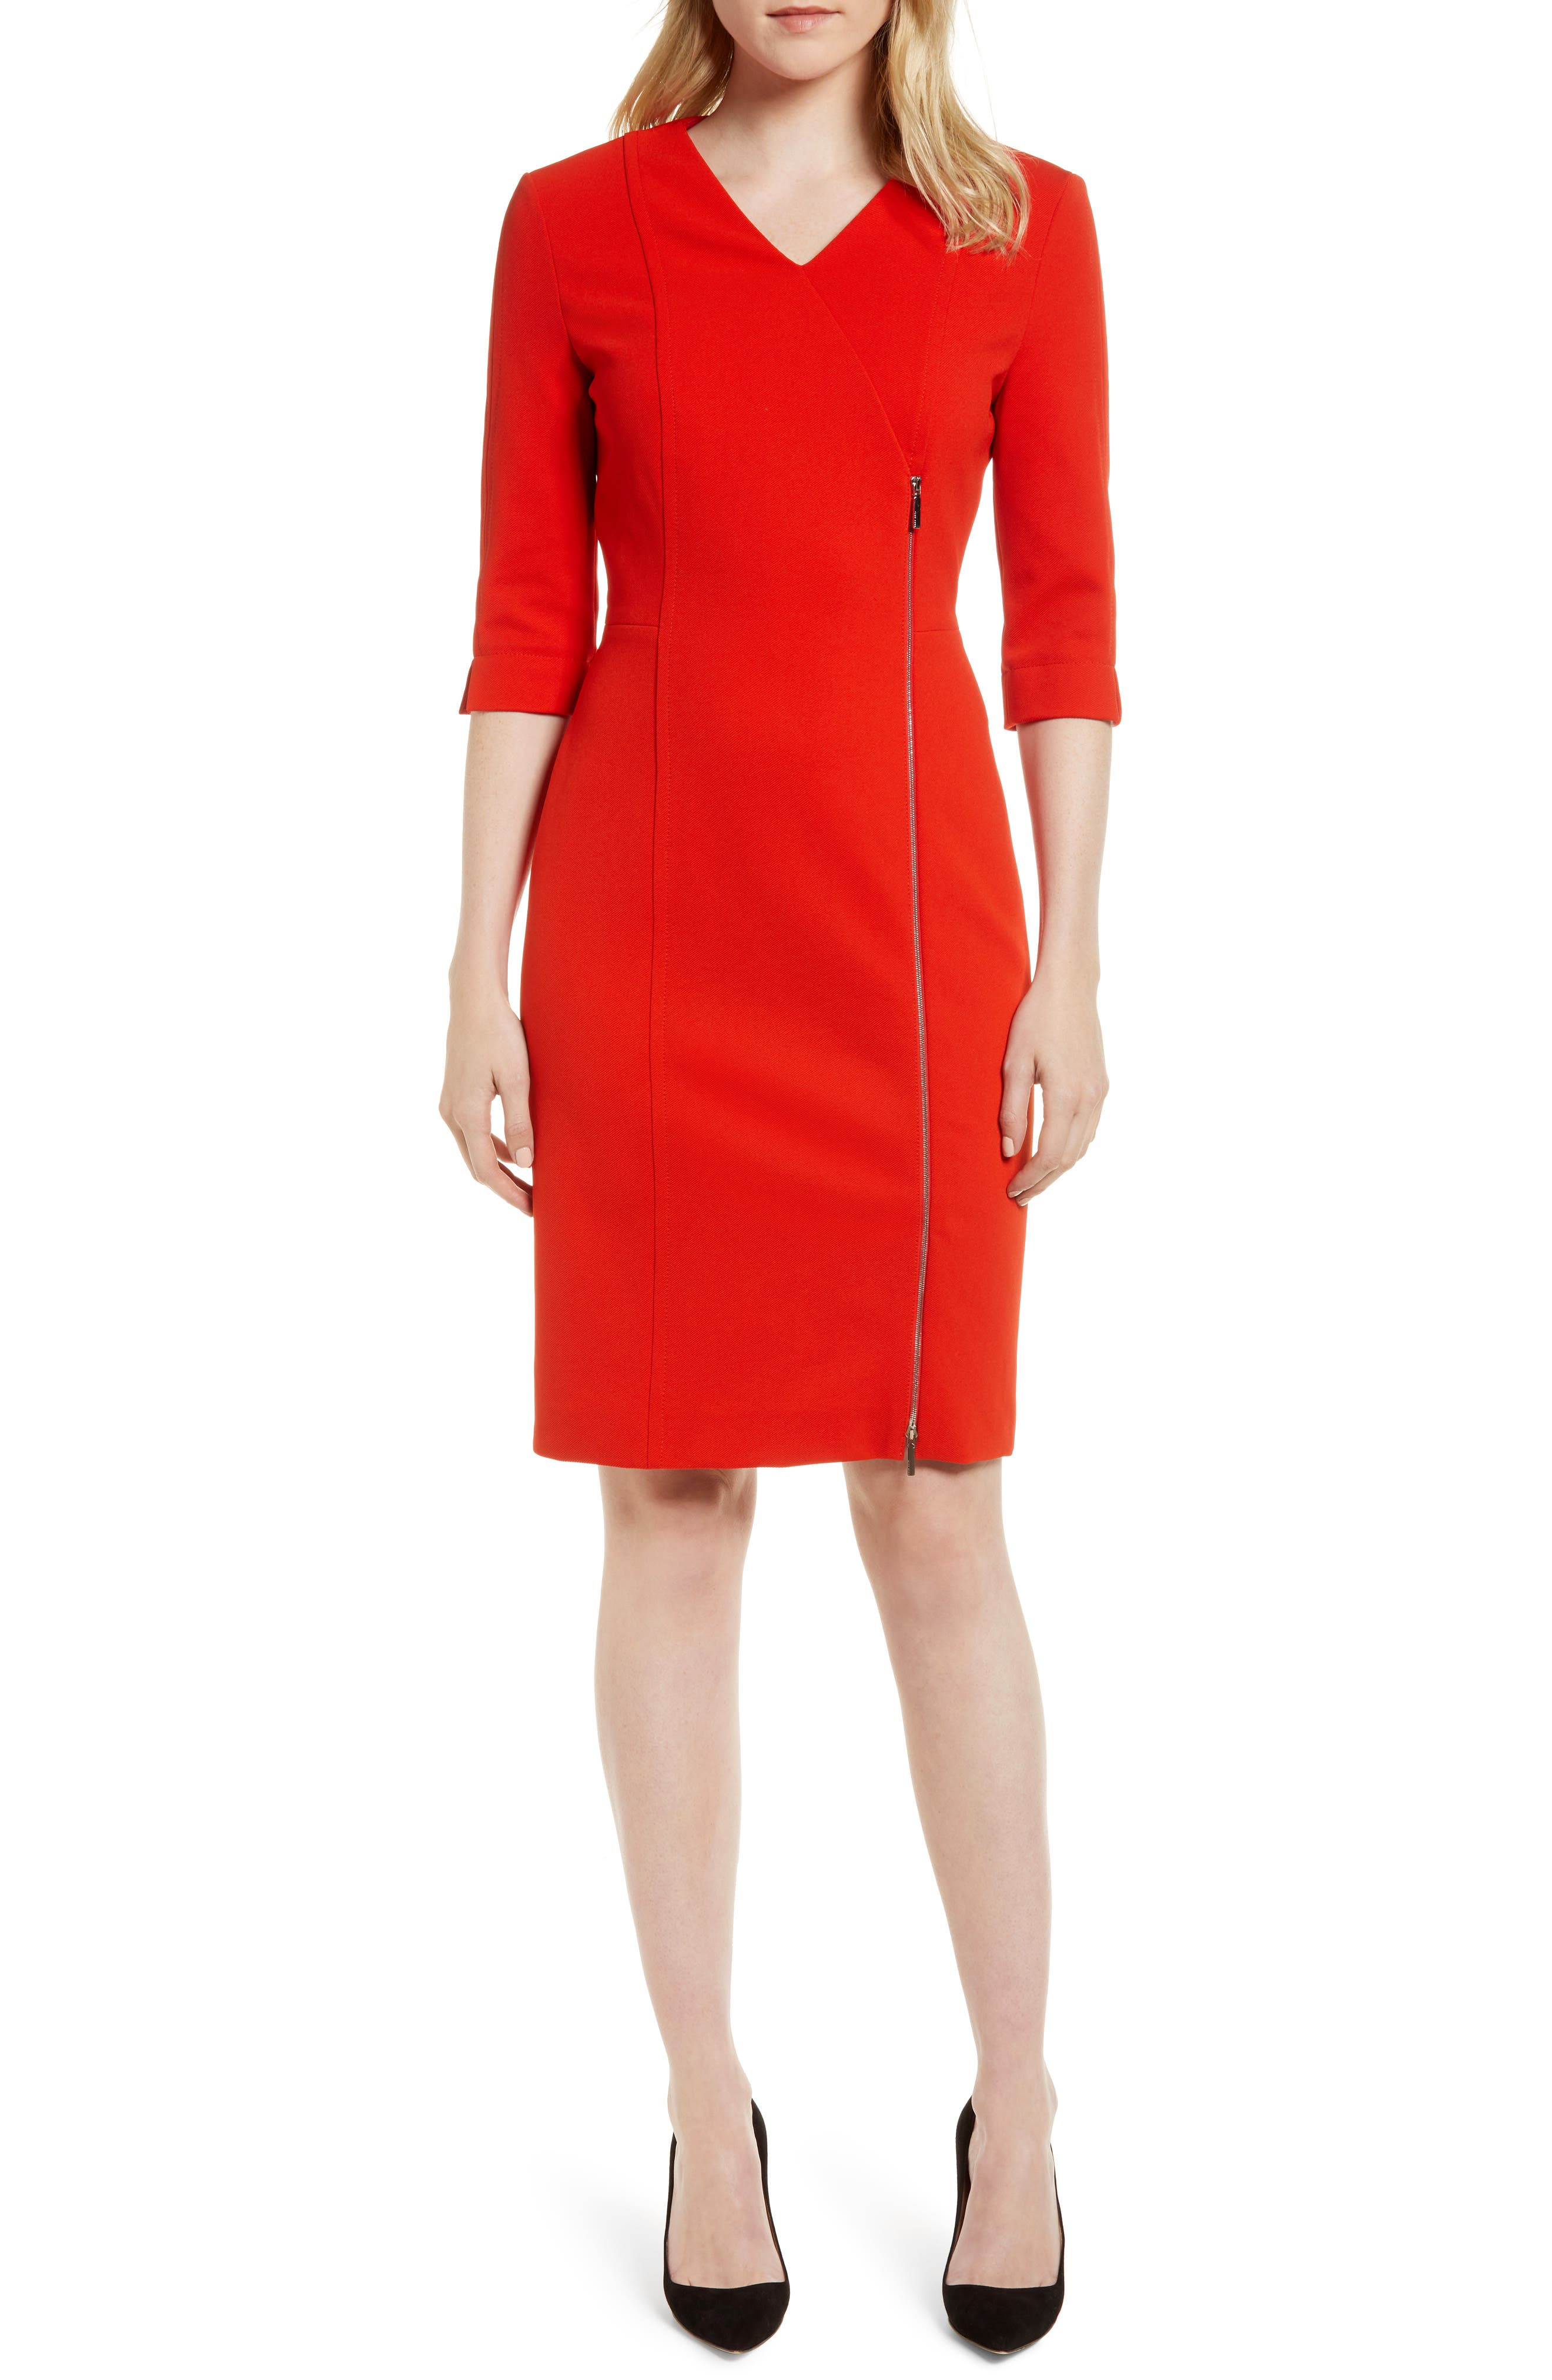 Deazema Twill Jersey Dress,                         Main,                         color, Sunset Orange